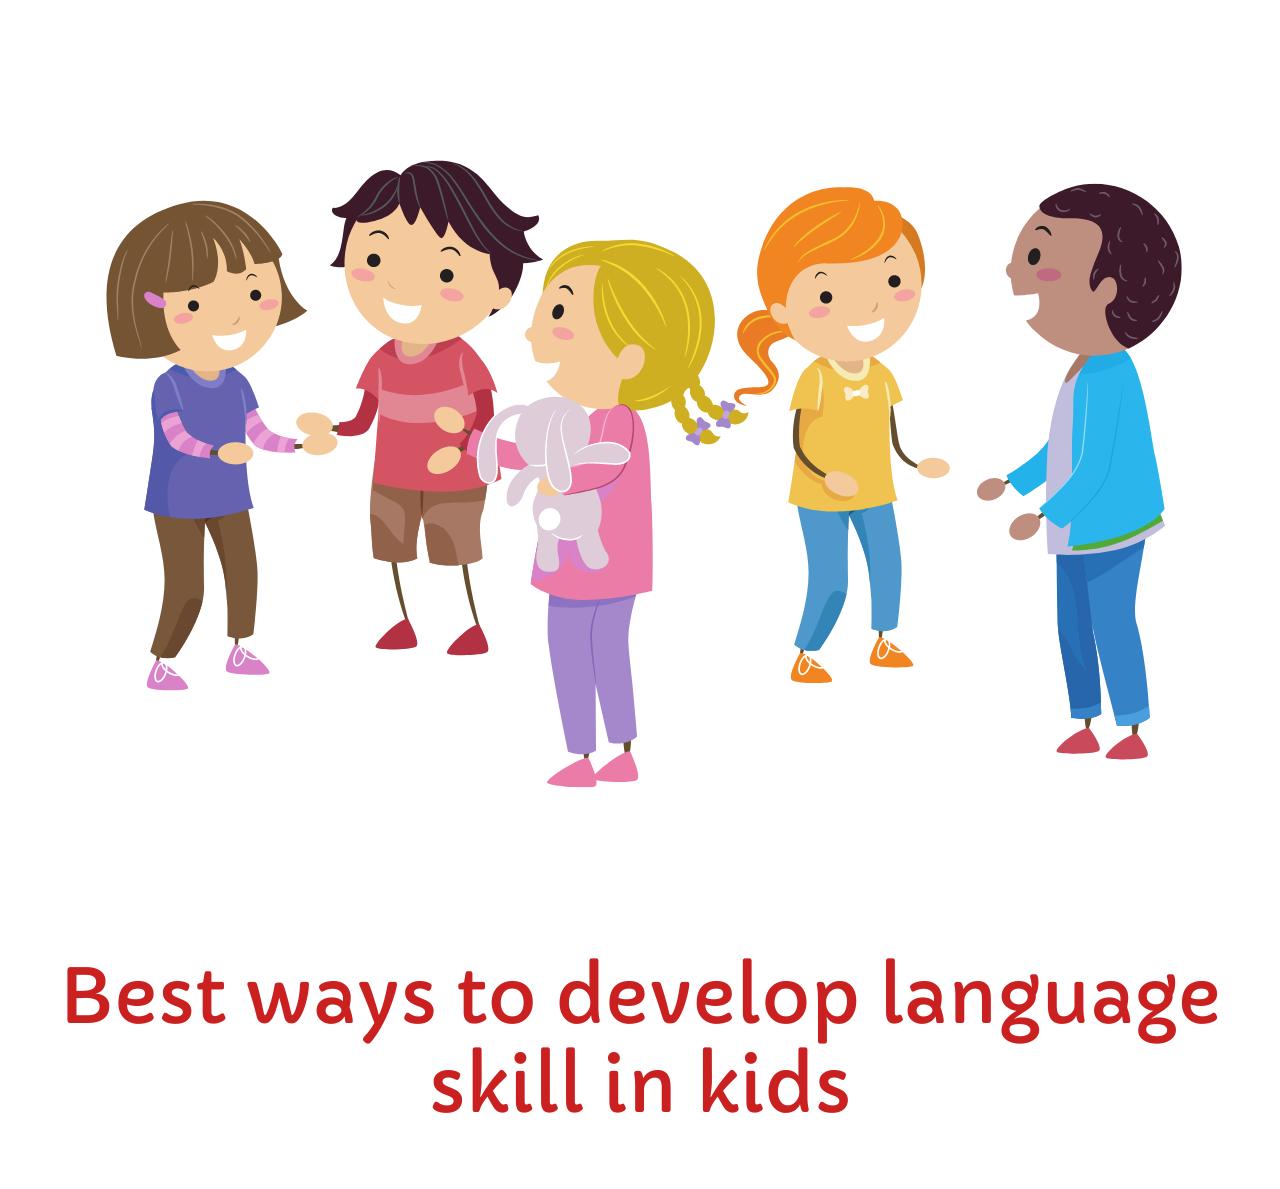 Language skill development in early childhood